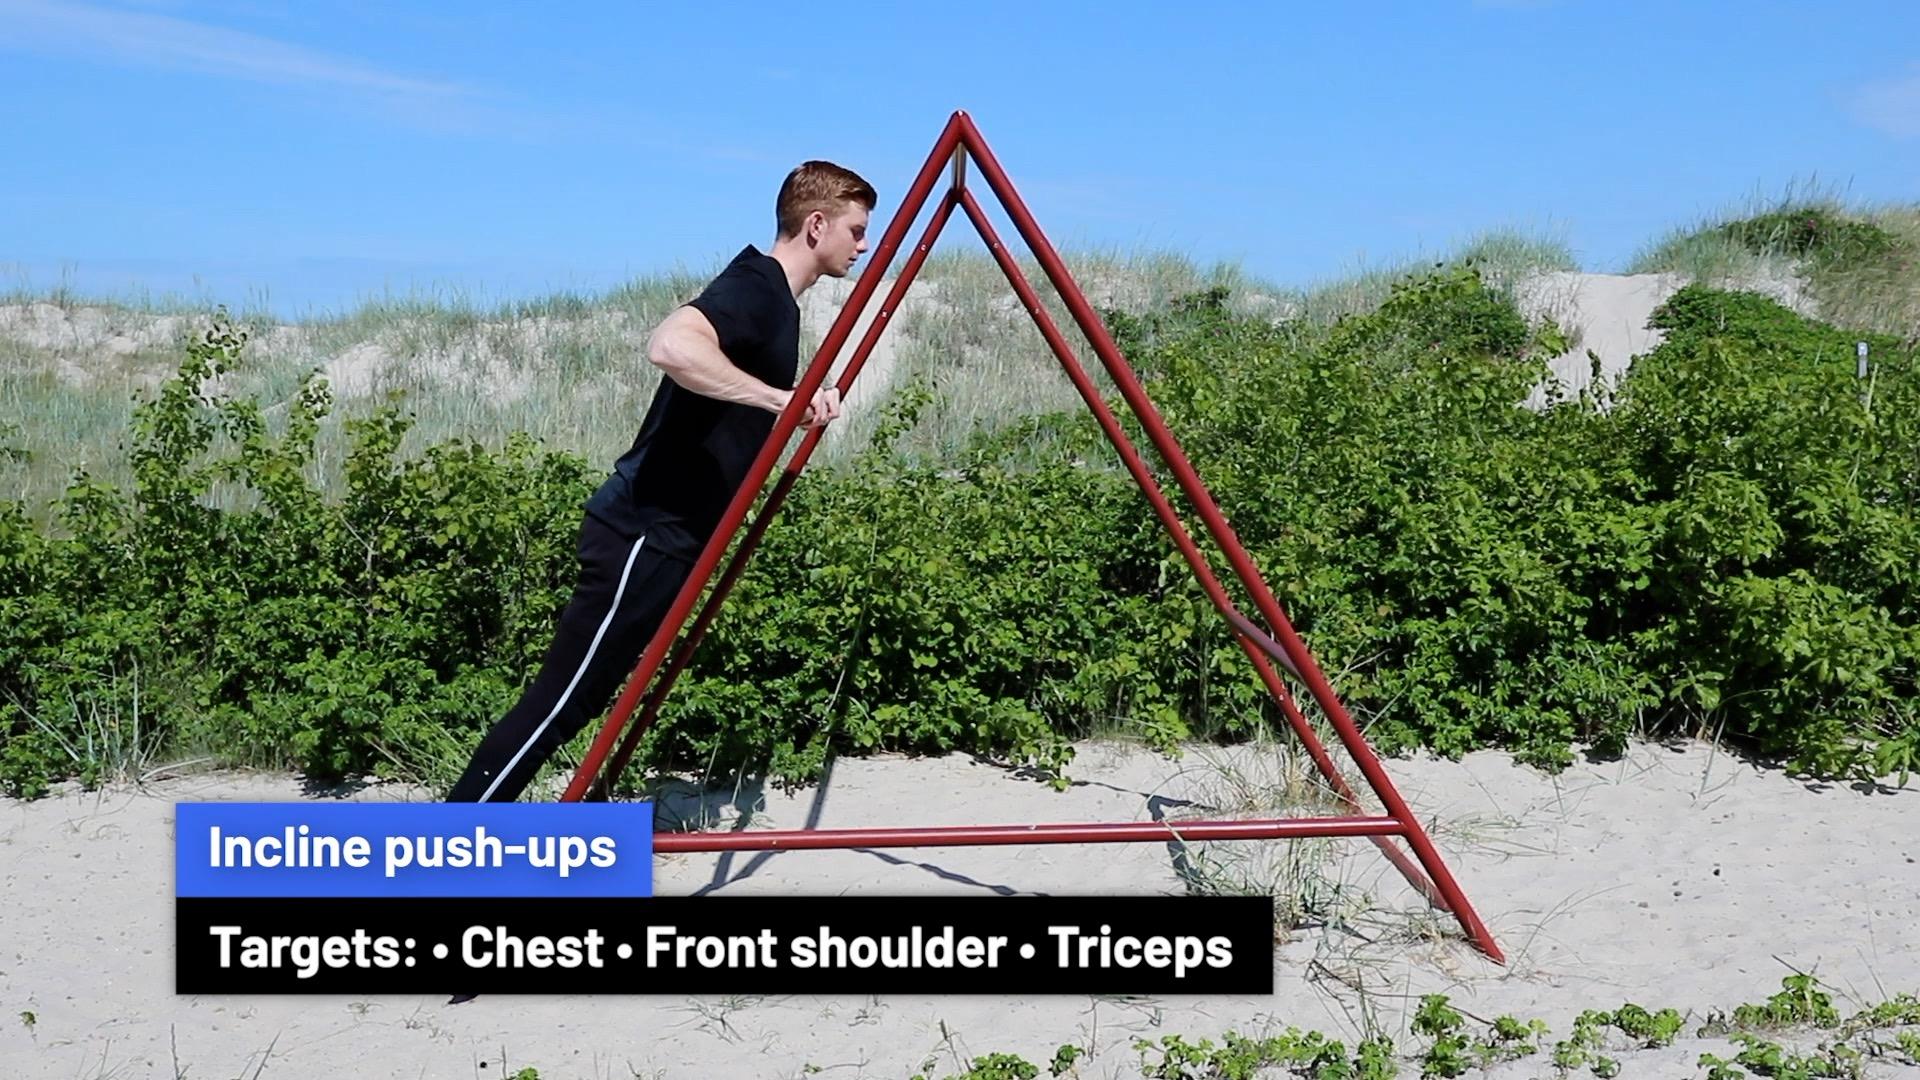 Incline push-ups